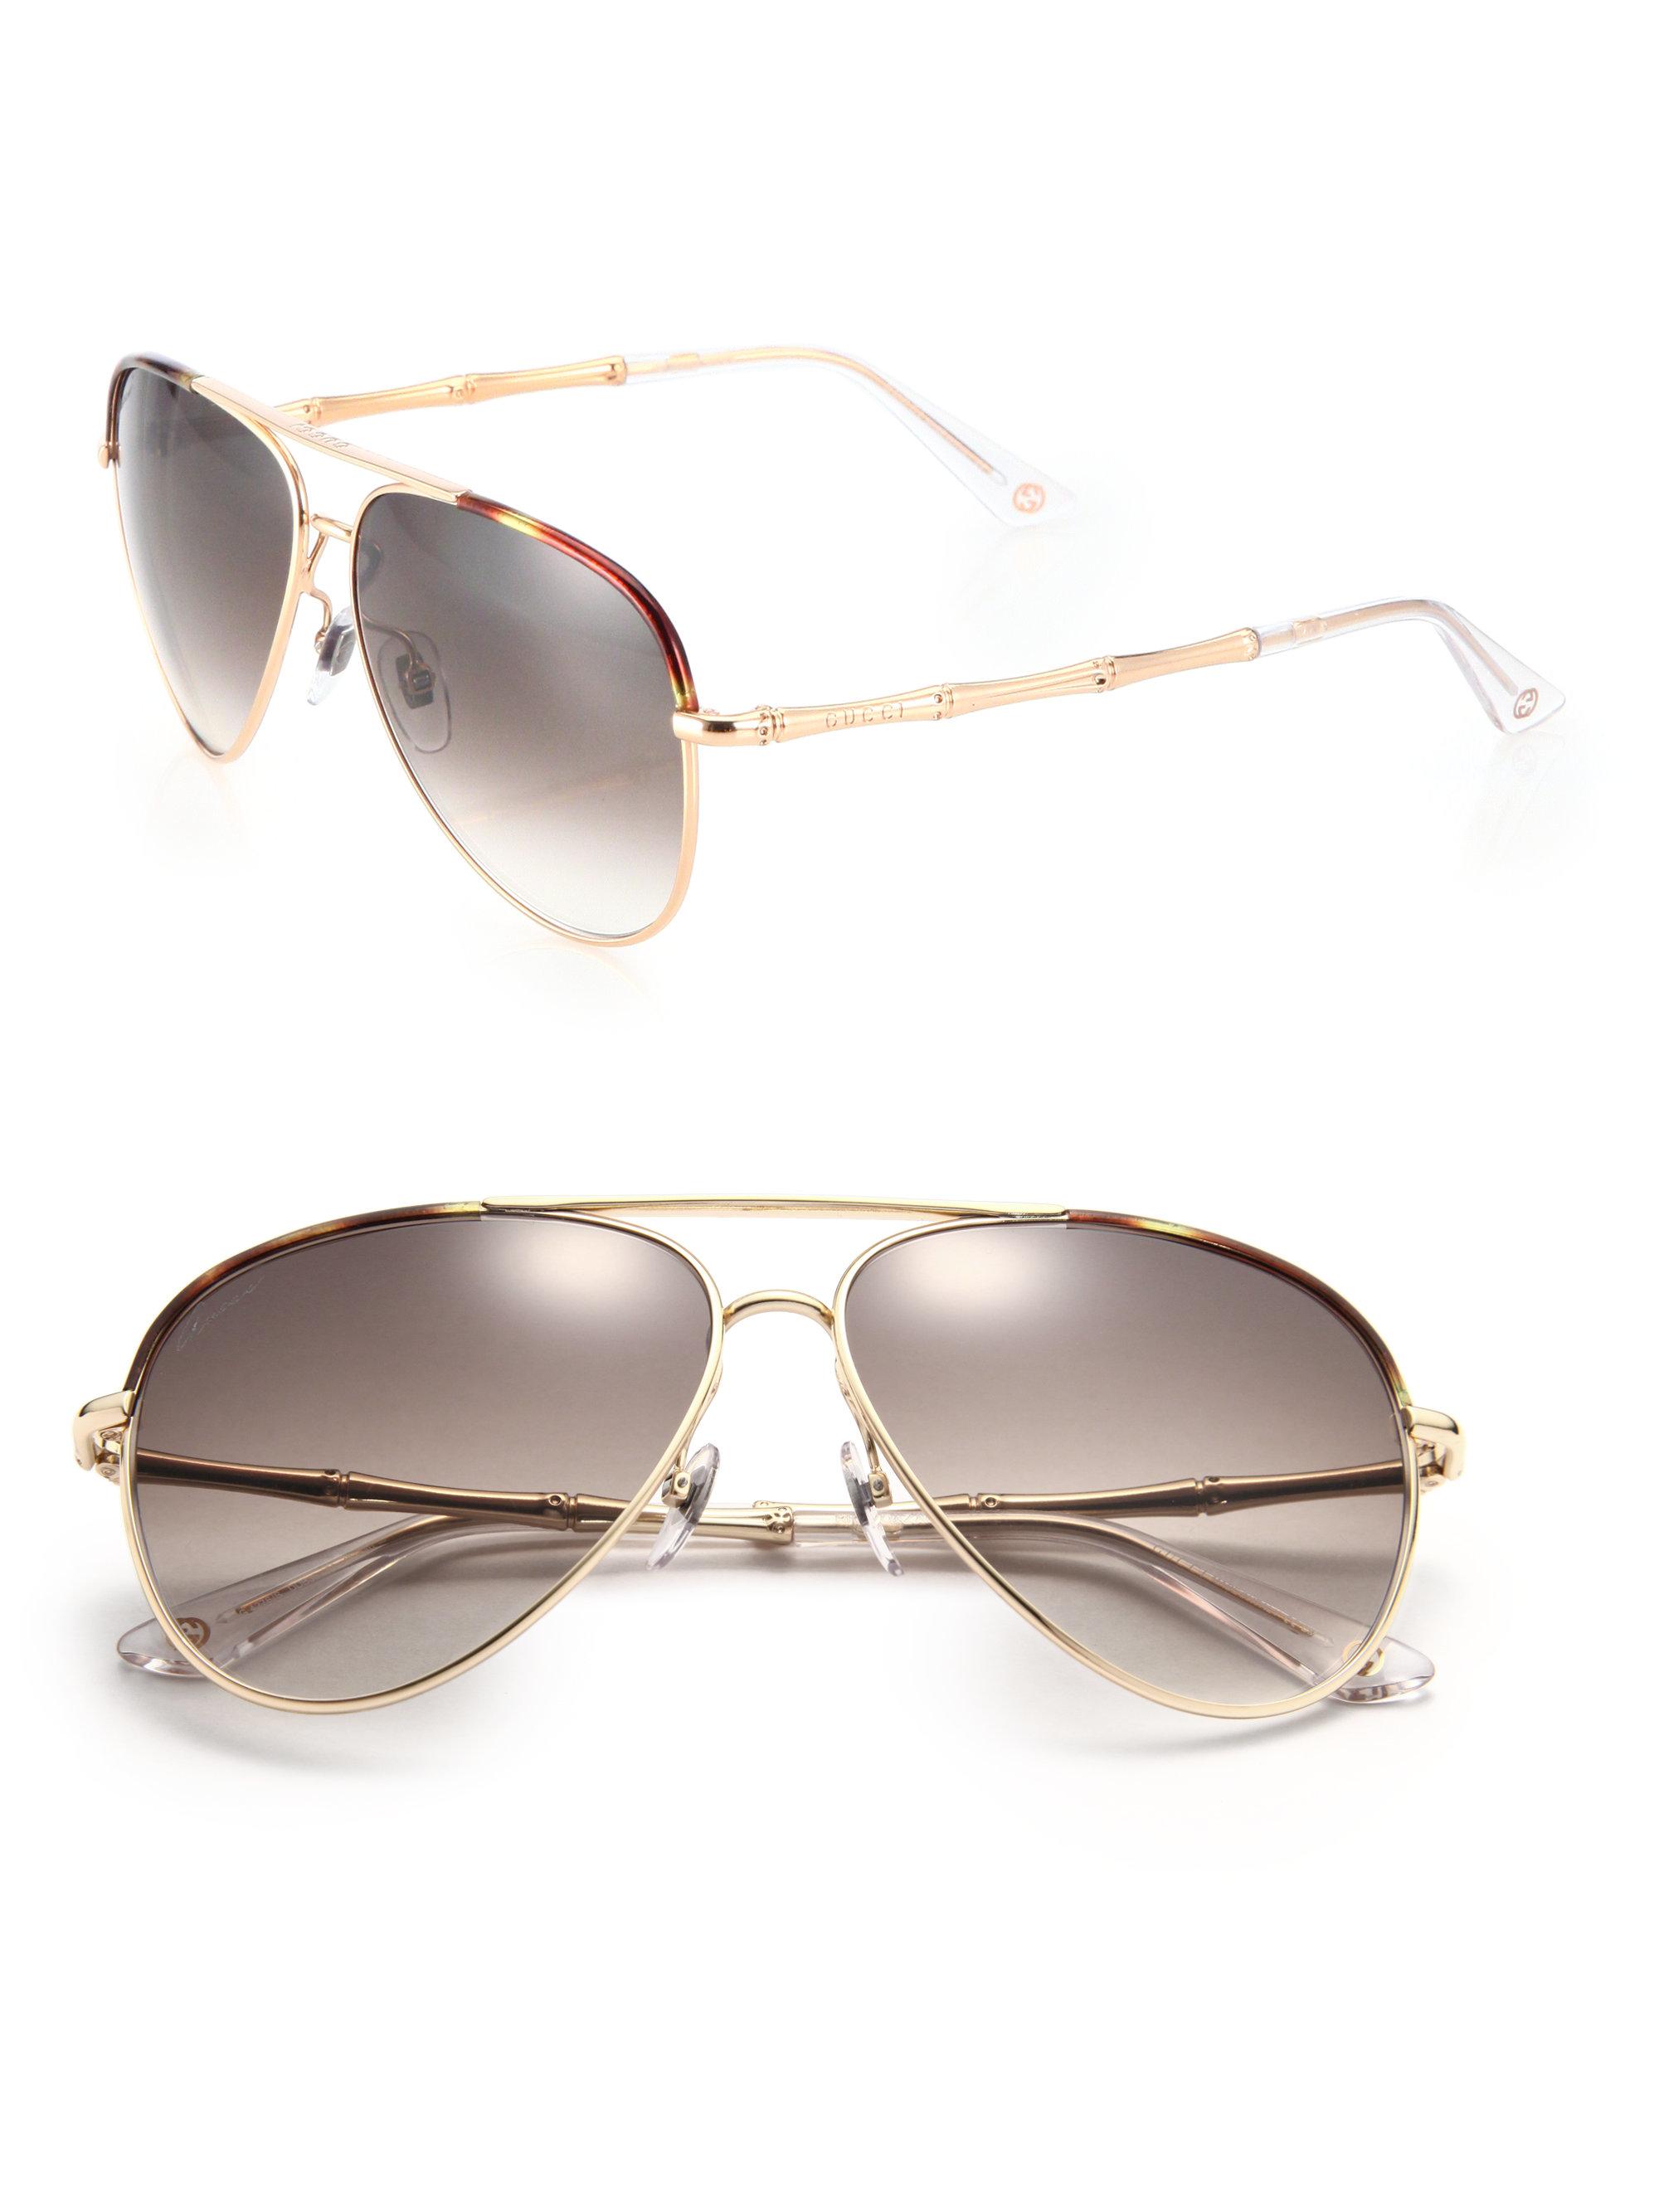 e5a231d330b Lyst - Gucci Bamboo 59mm Aviator Sunglasses in Brown for Men